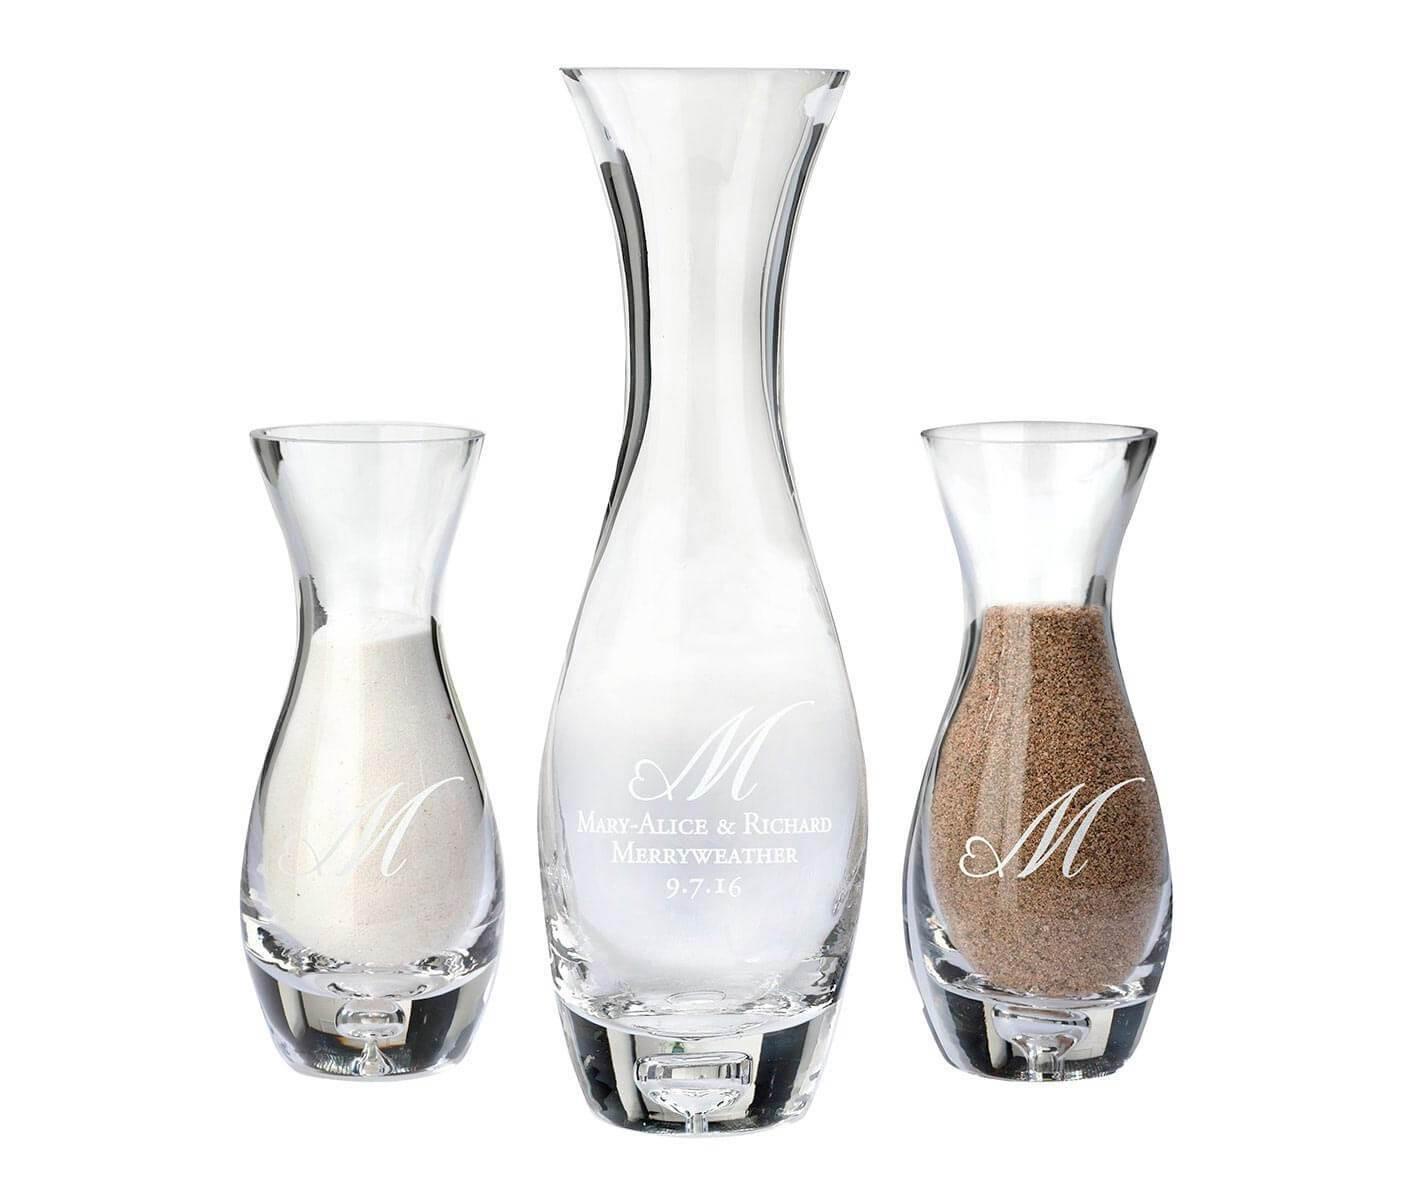 sand ceremony vases of monogram vase intended for unity sand ceremony set together forever heart monogram personalization